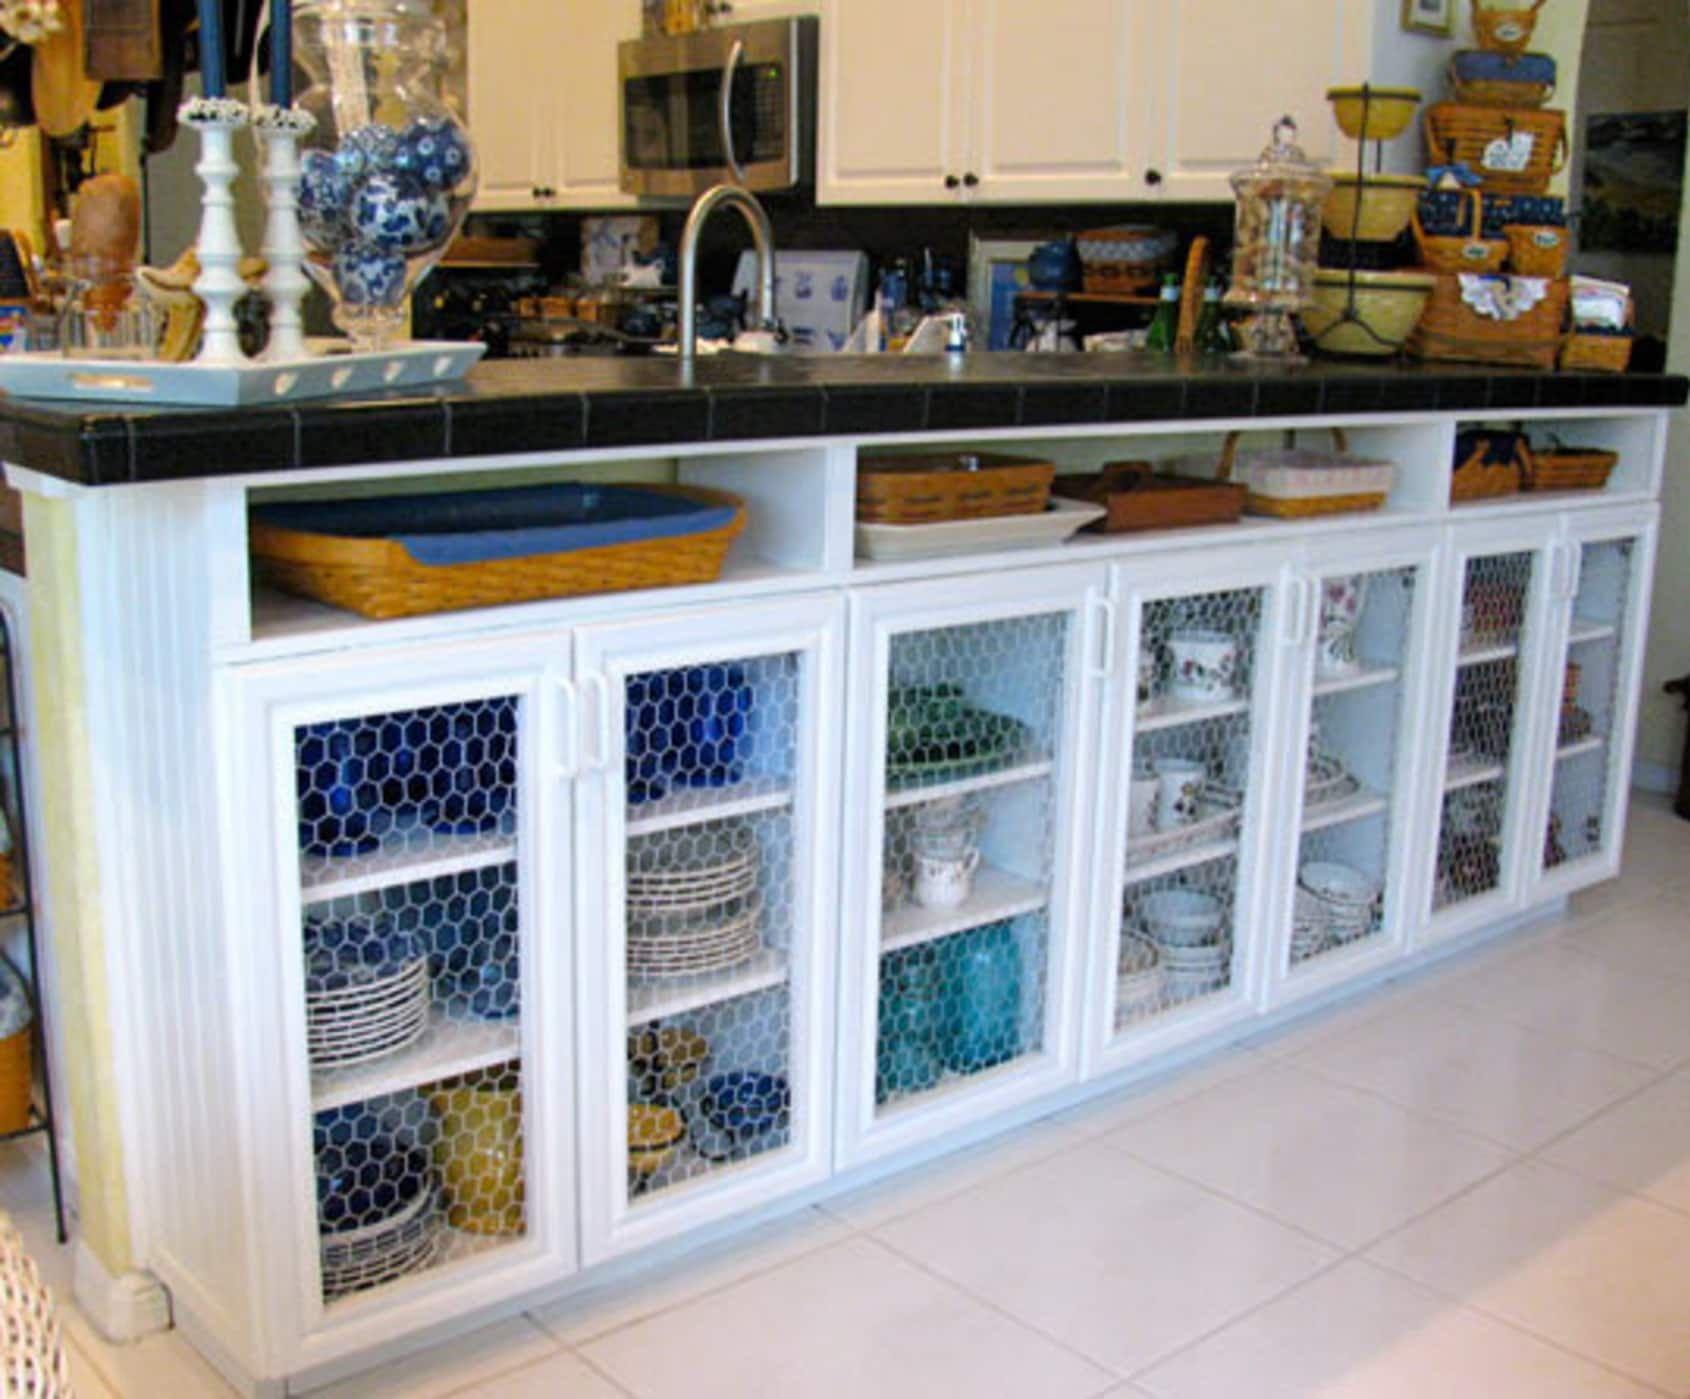 Before After From Breakfast Bar To Storage Space Kitchen Cabinet Remodel Kitchen Bar Bar Storage